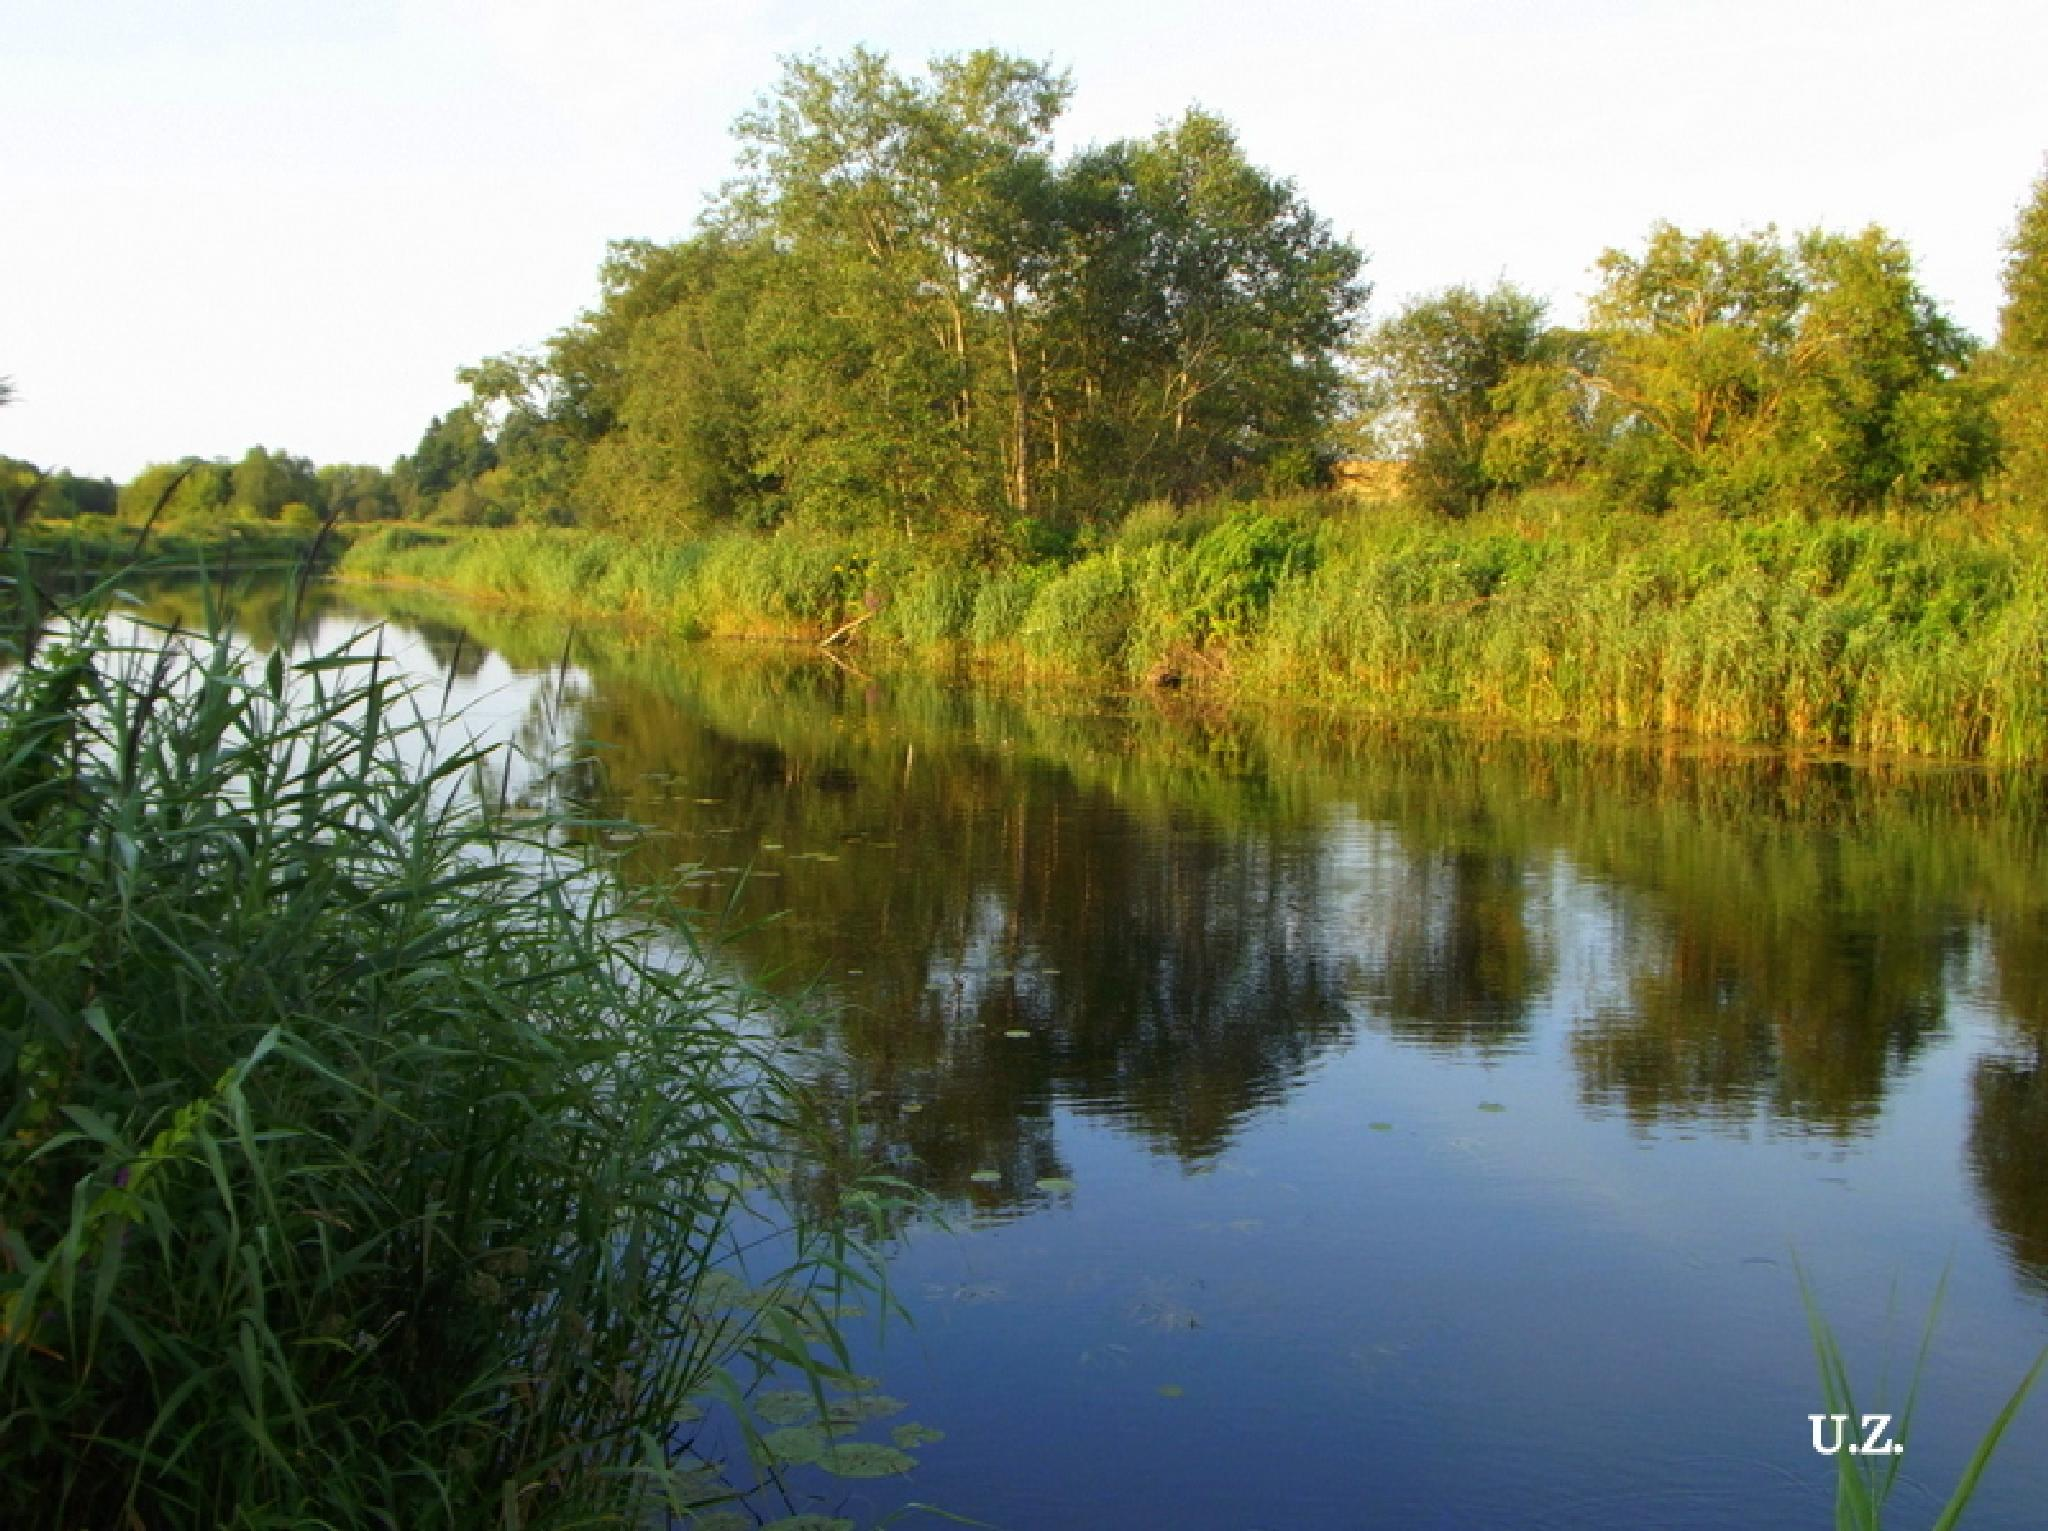 Summer morning on the river by Zita Užkuraitienė